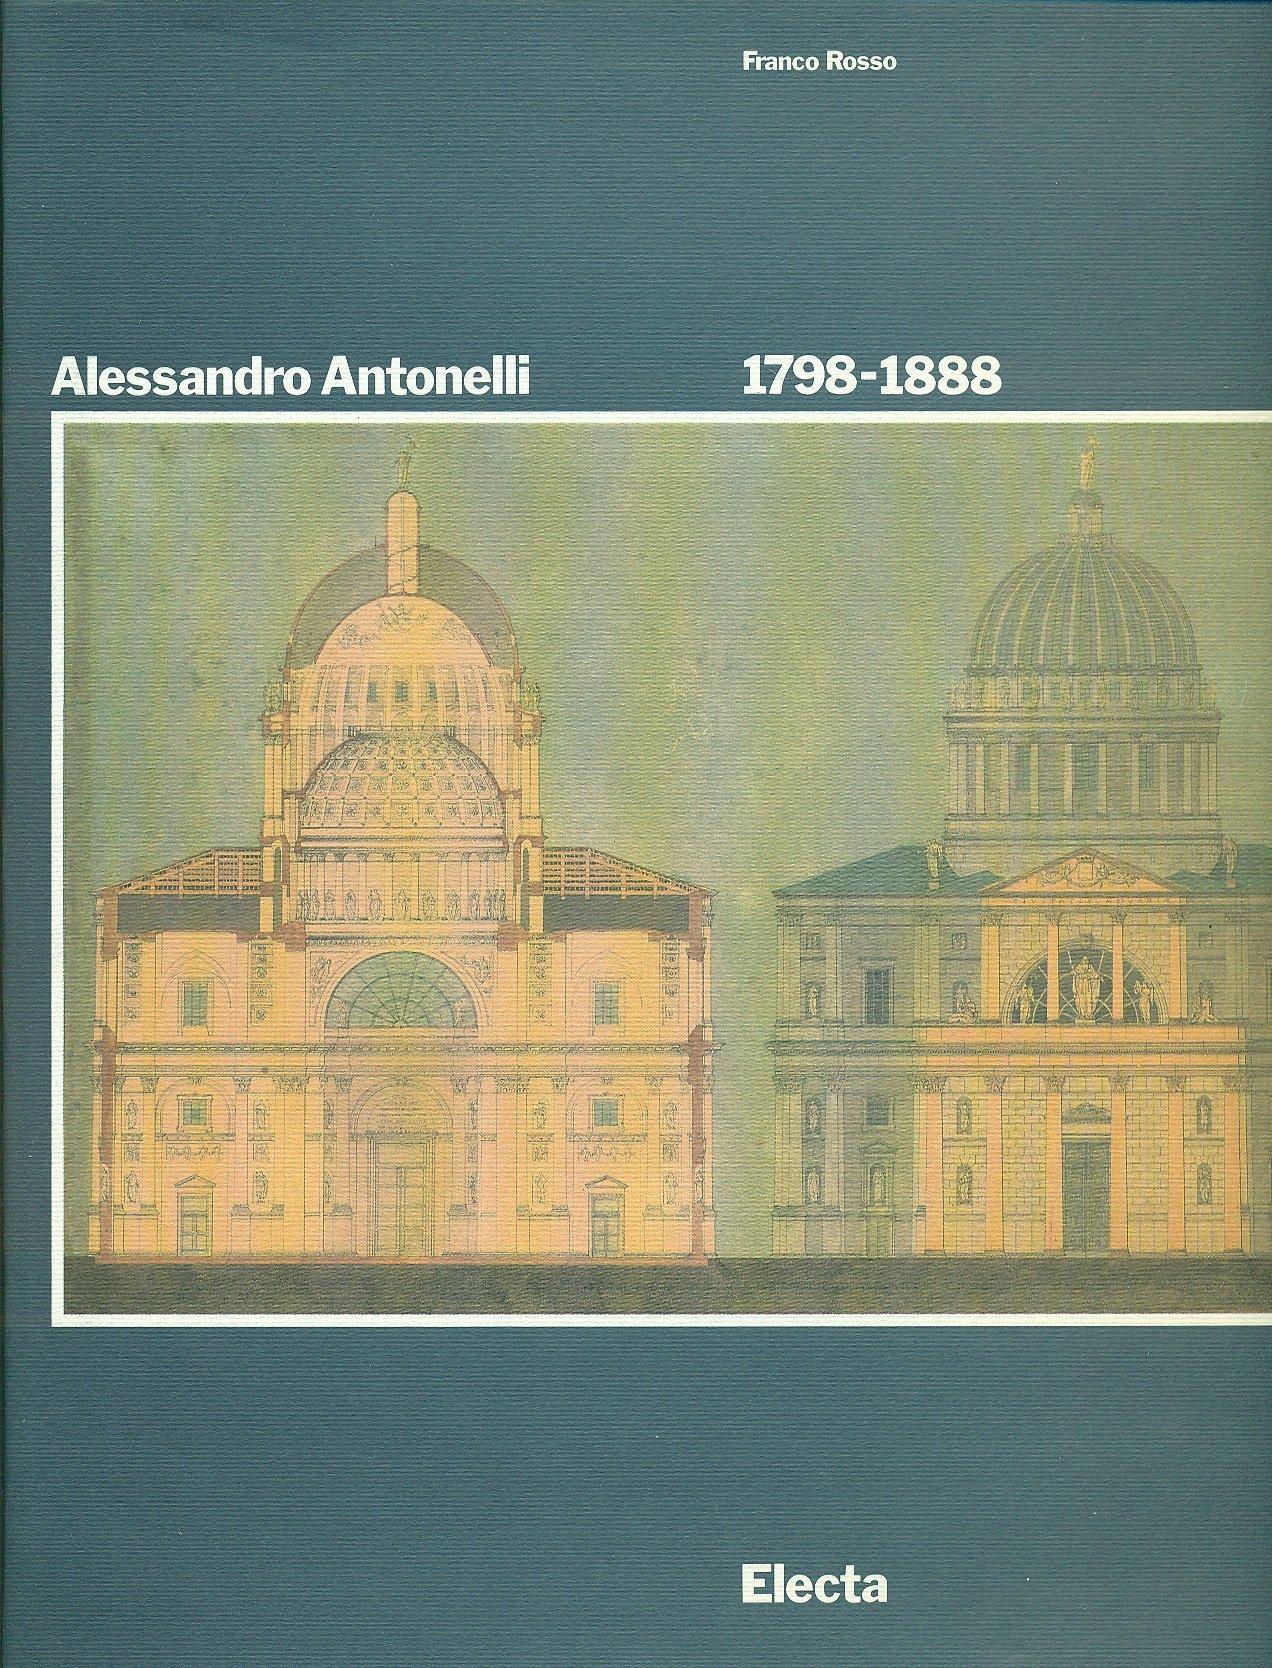 Alessandro Antonelli (1798-1888). Ediz. illustrata Copertina rigida – 17 ott 1989 Franco Rosso Mondadori Electa 8843528483 ARCHITETTURA